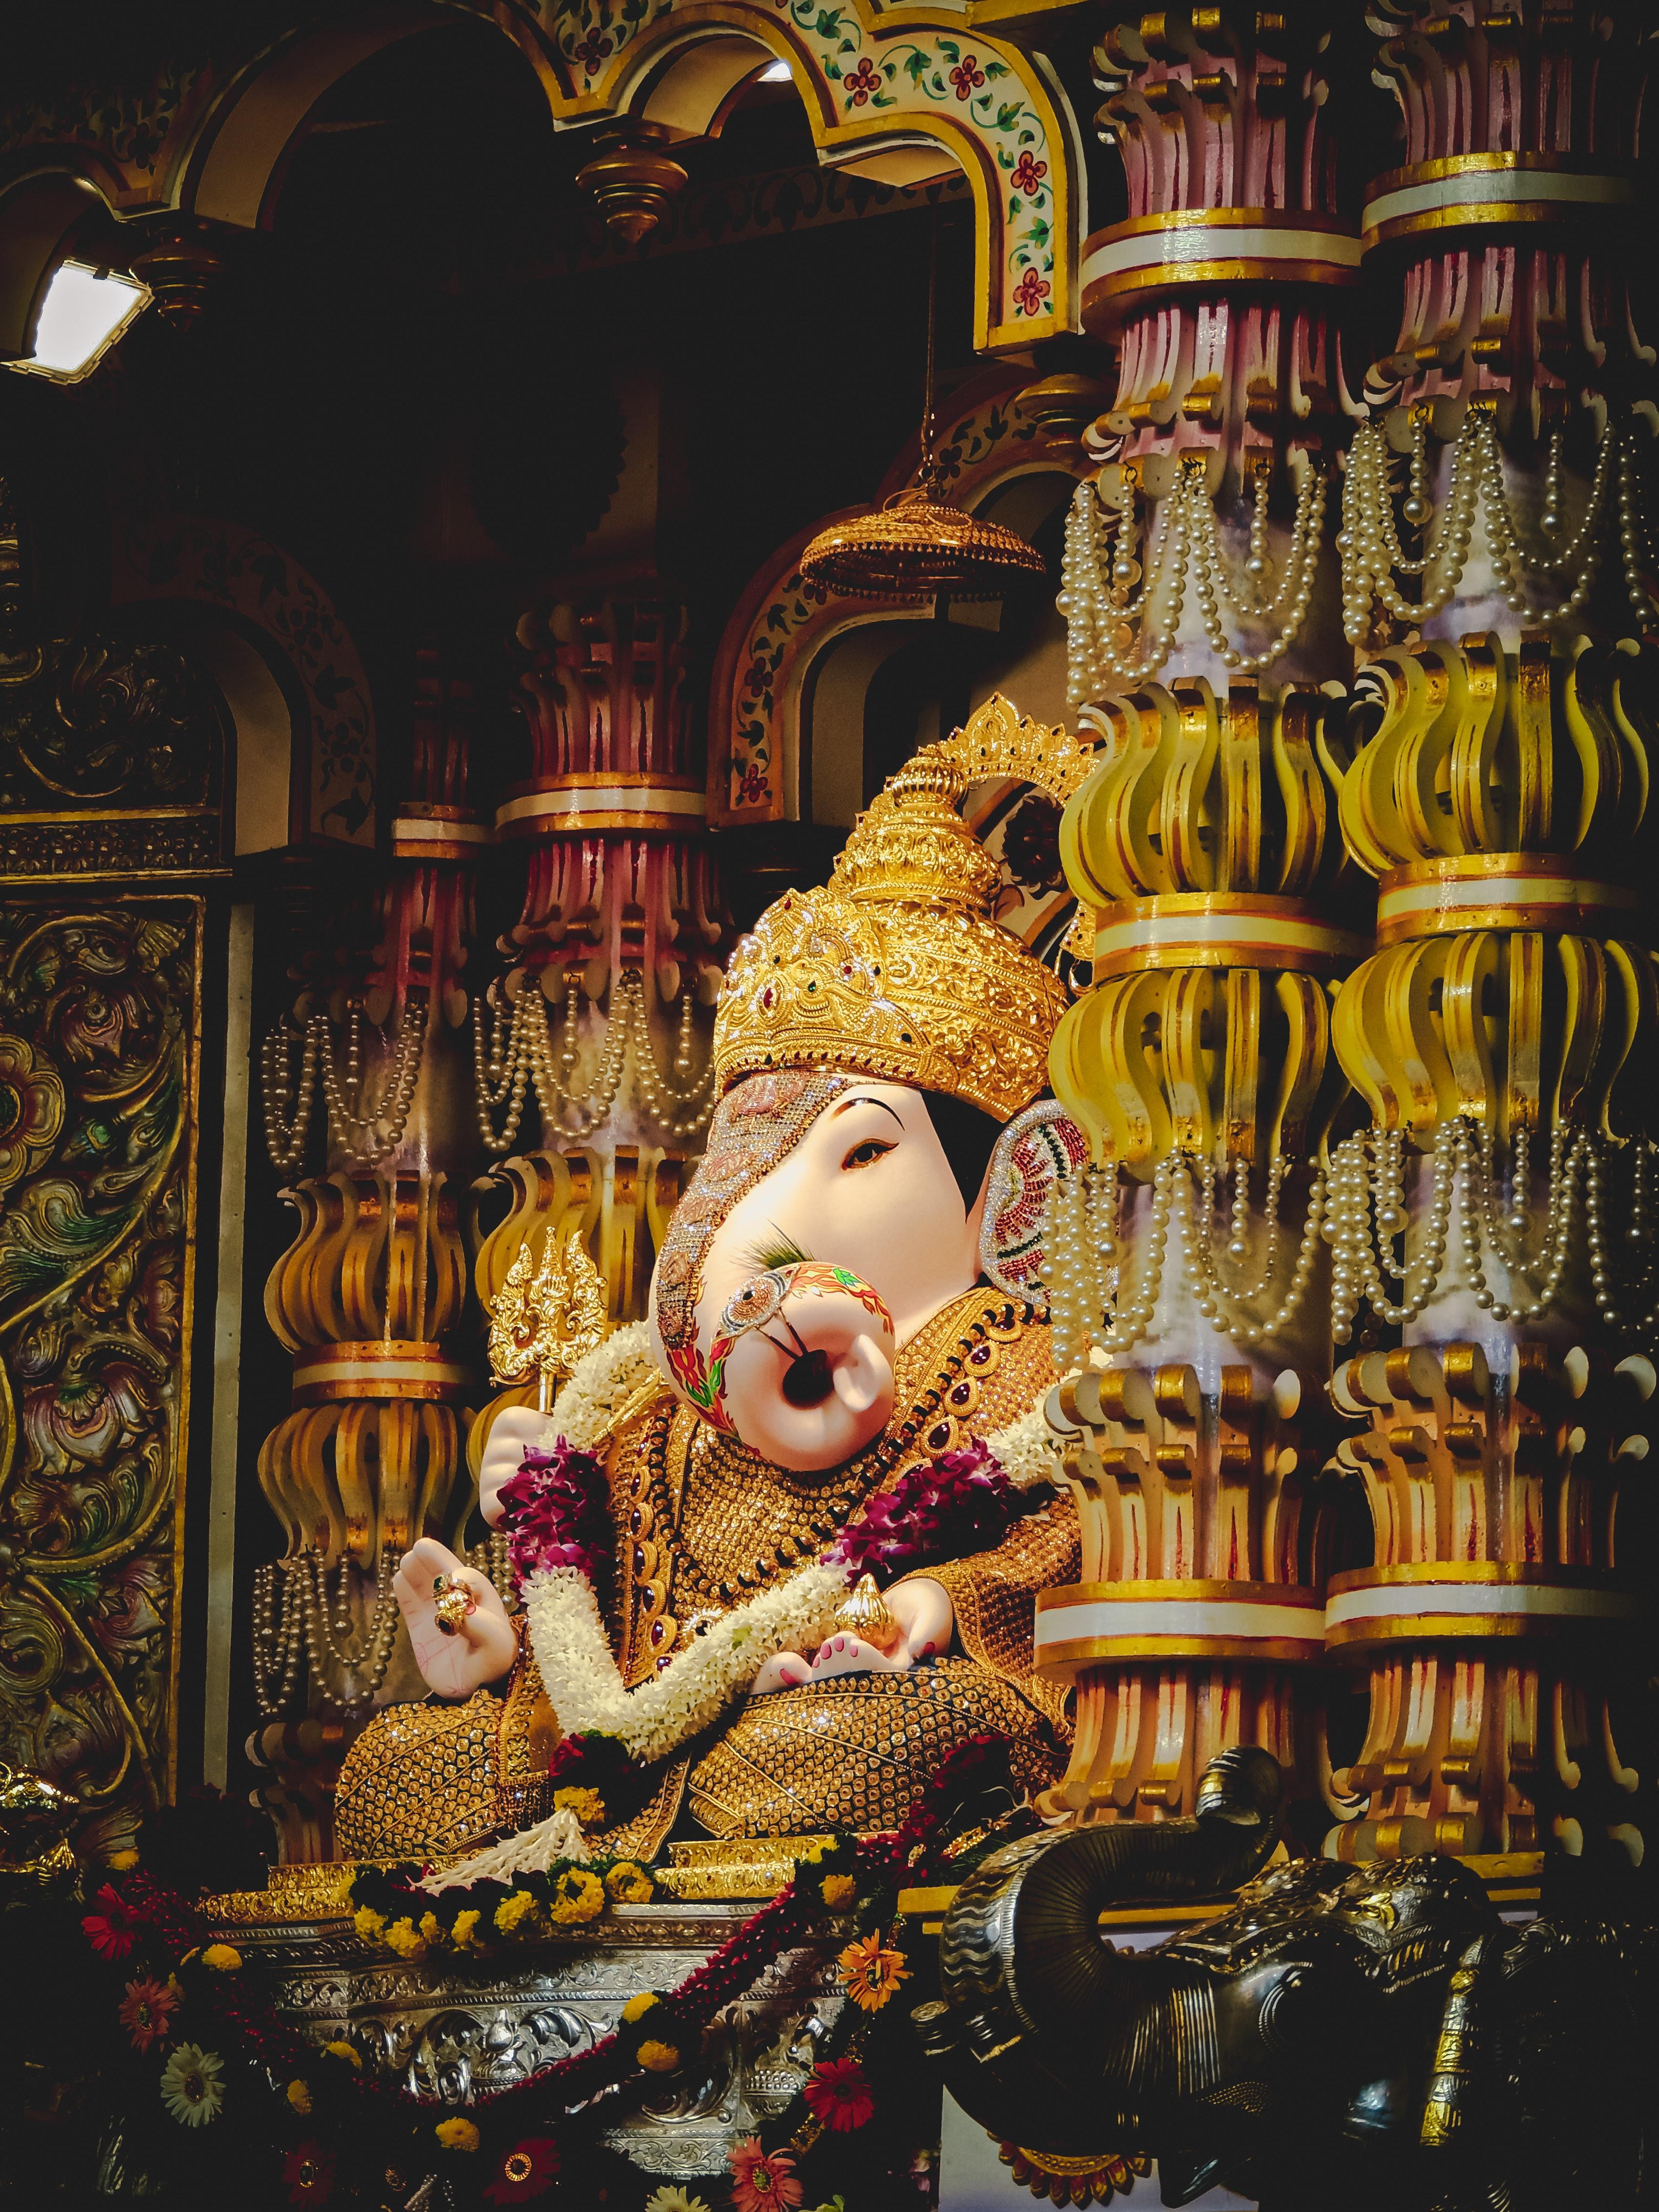 58425 free wallpaper 1080x1920 for phone, download images God, Ganesha, Gold, Miscellanea, Miscellaneous, Statuette, Golden, Deity, Column, Columns, Religion 1080x1920 for mobile